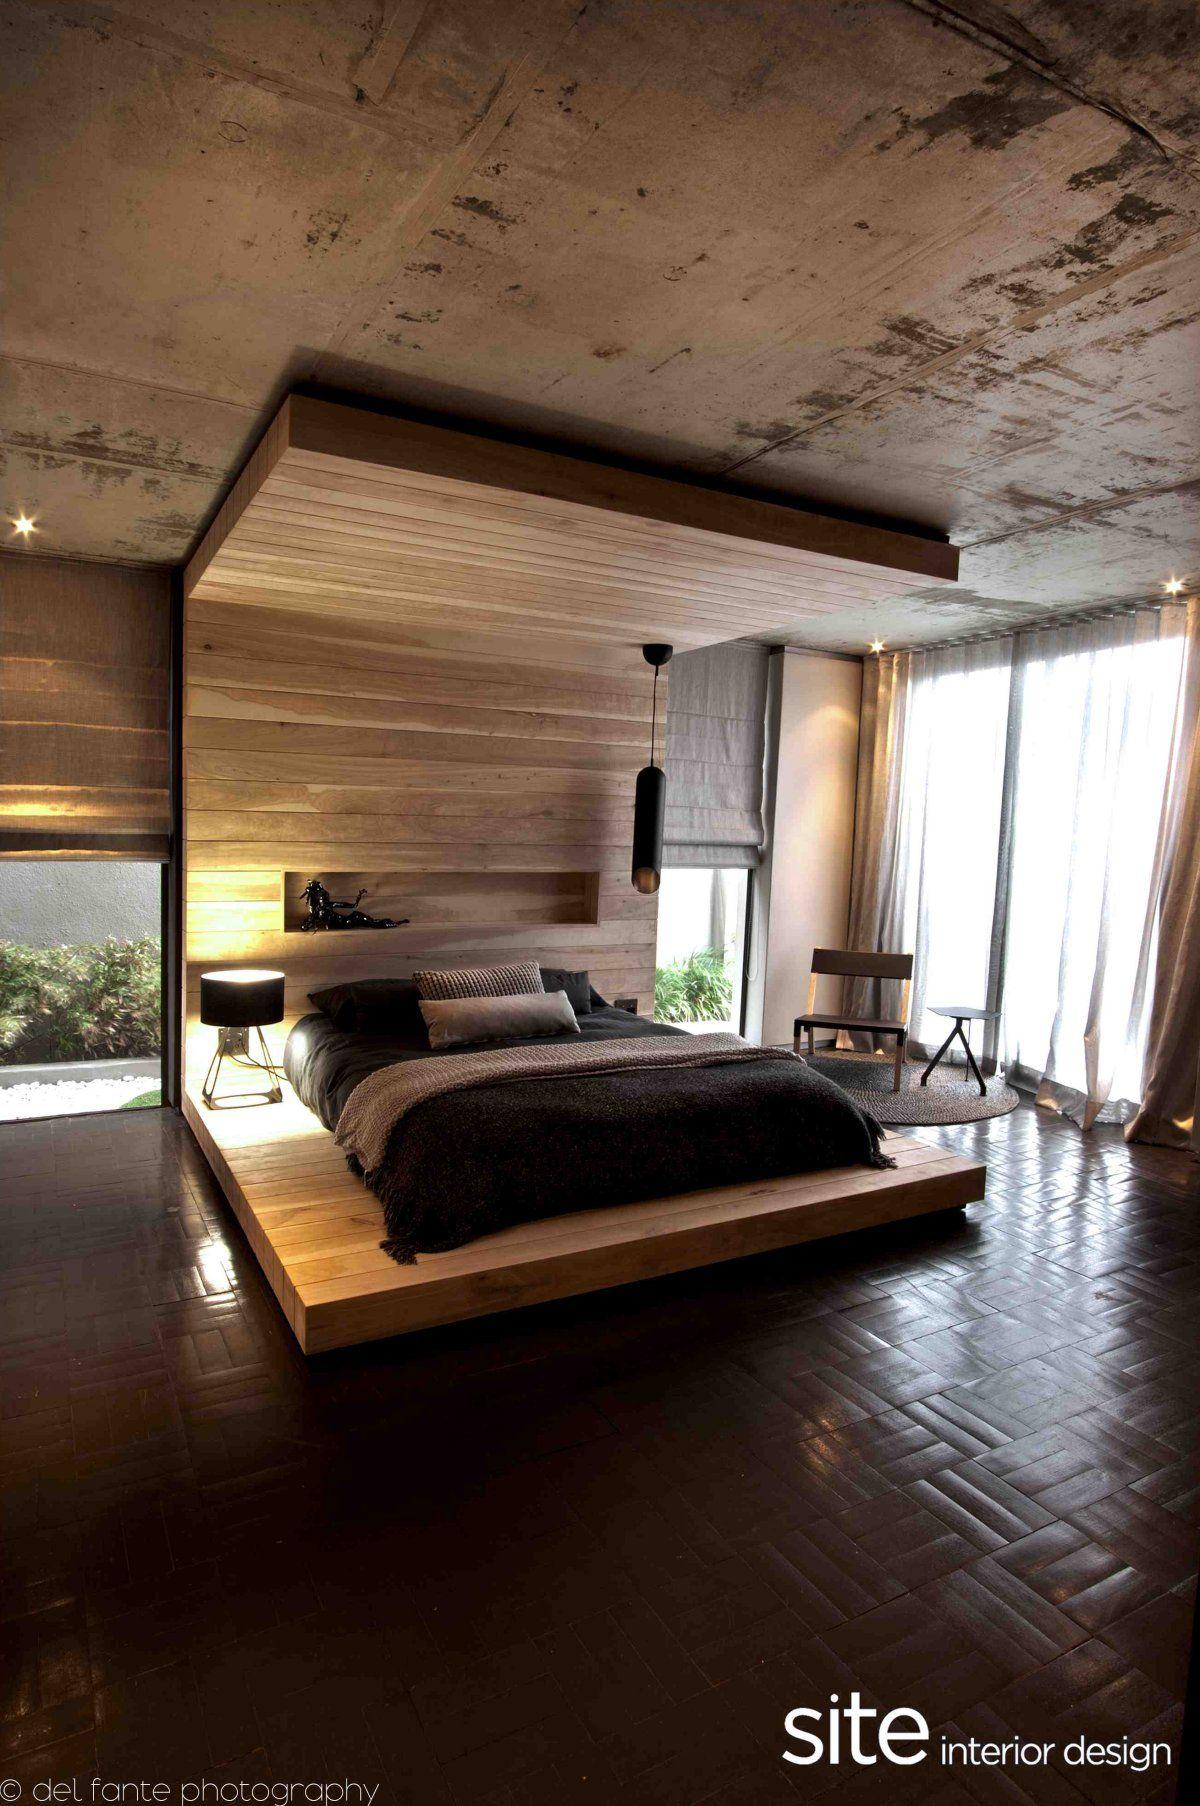 Uns zu hause innenarchitektur bedroom interior design at the aupiais house by site interior design